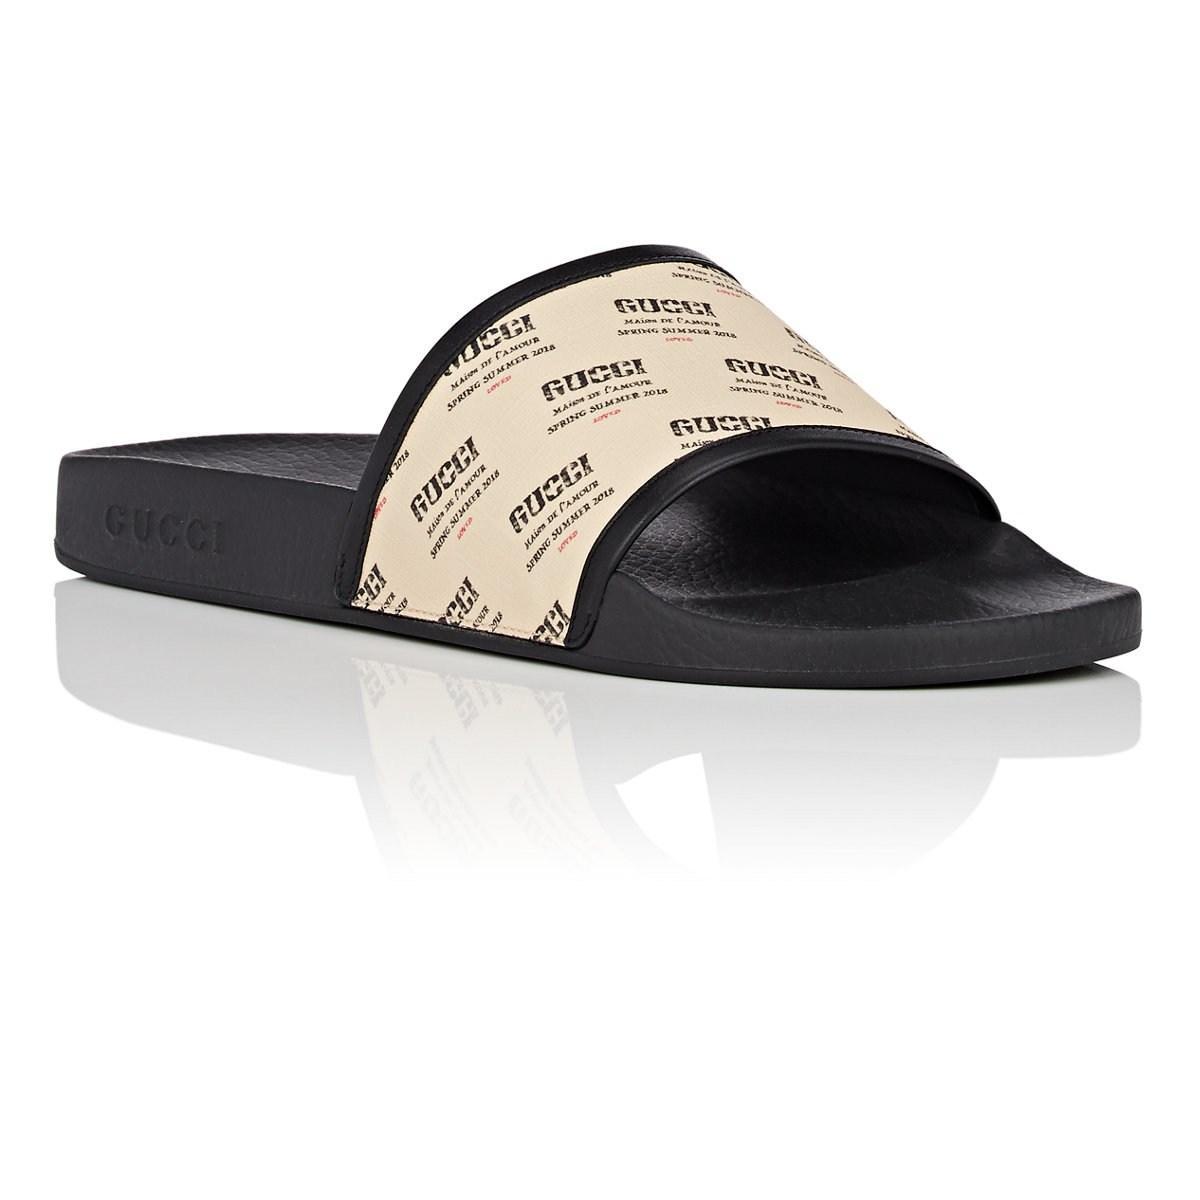 2efa22f9588 Gucci Invitation-print Slide Sandals in White for Men - Lyst